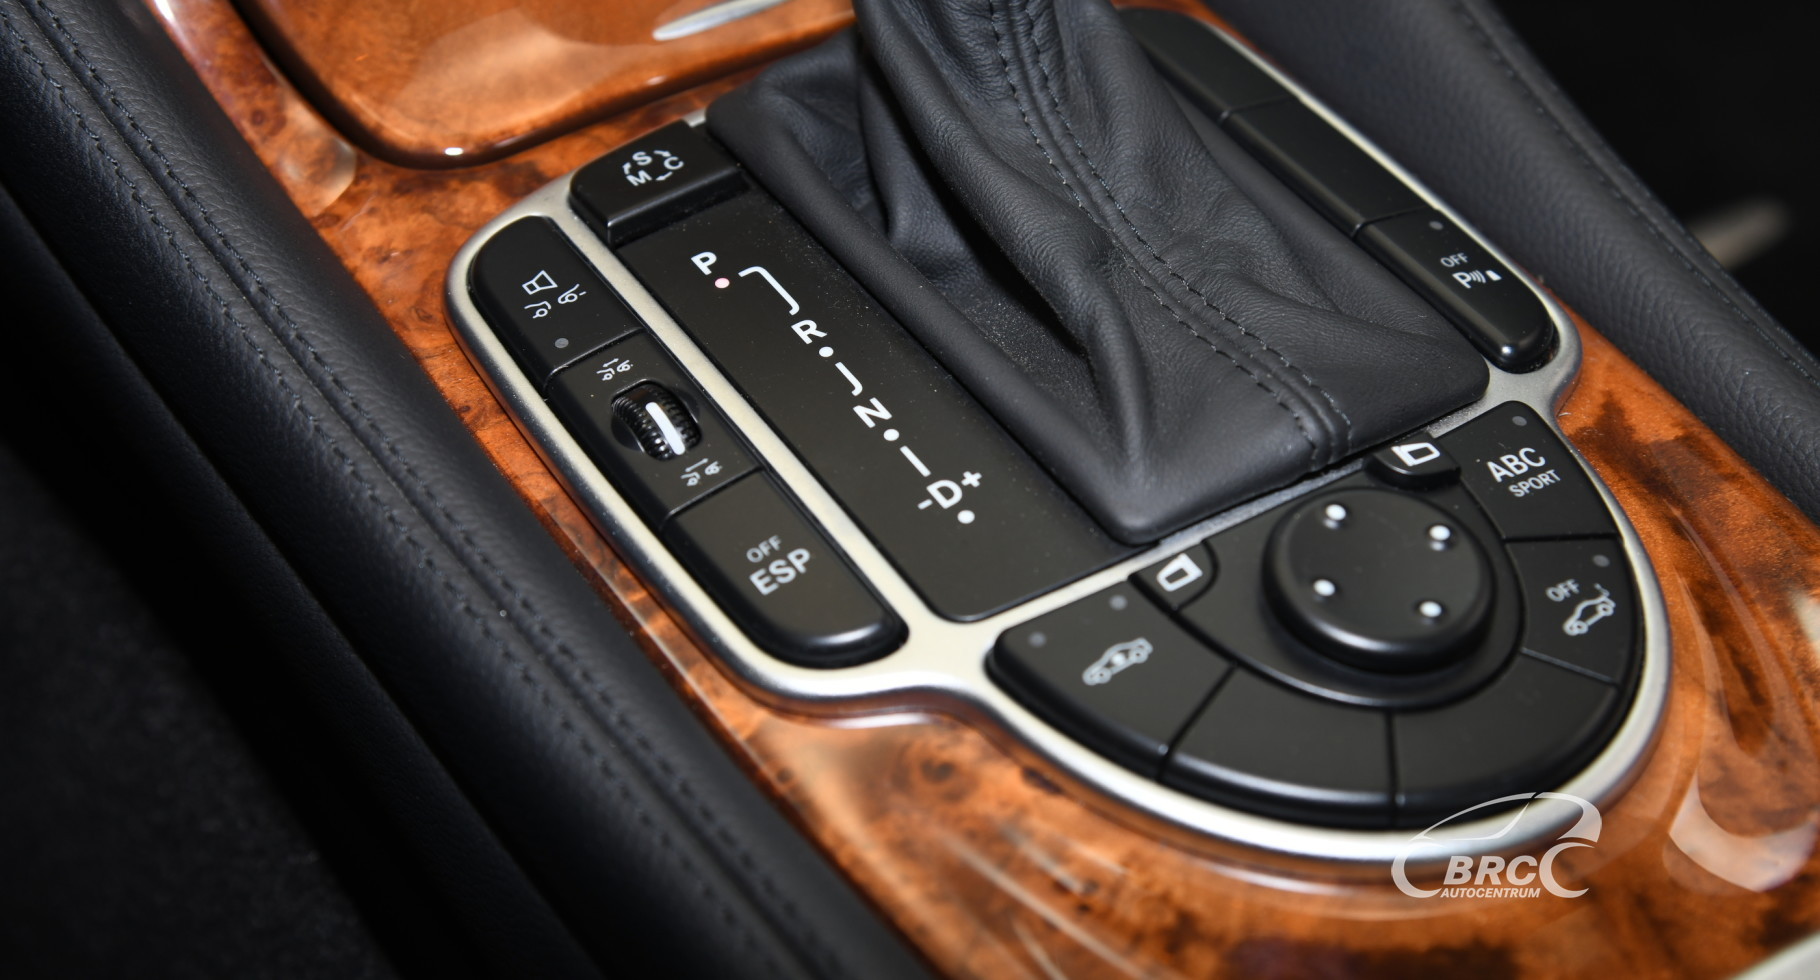 Mercedes-Benz SL 550 Automatas